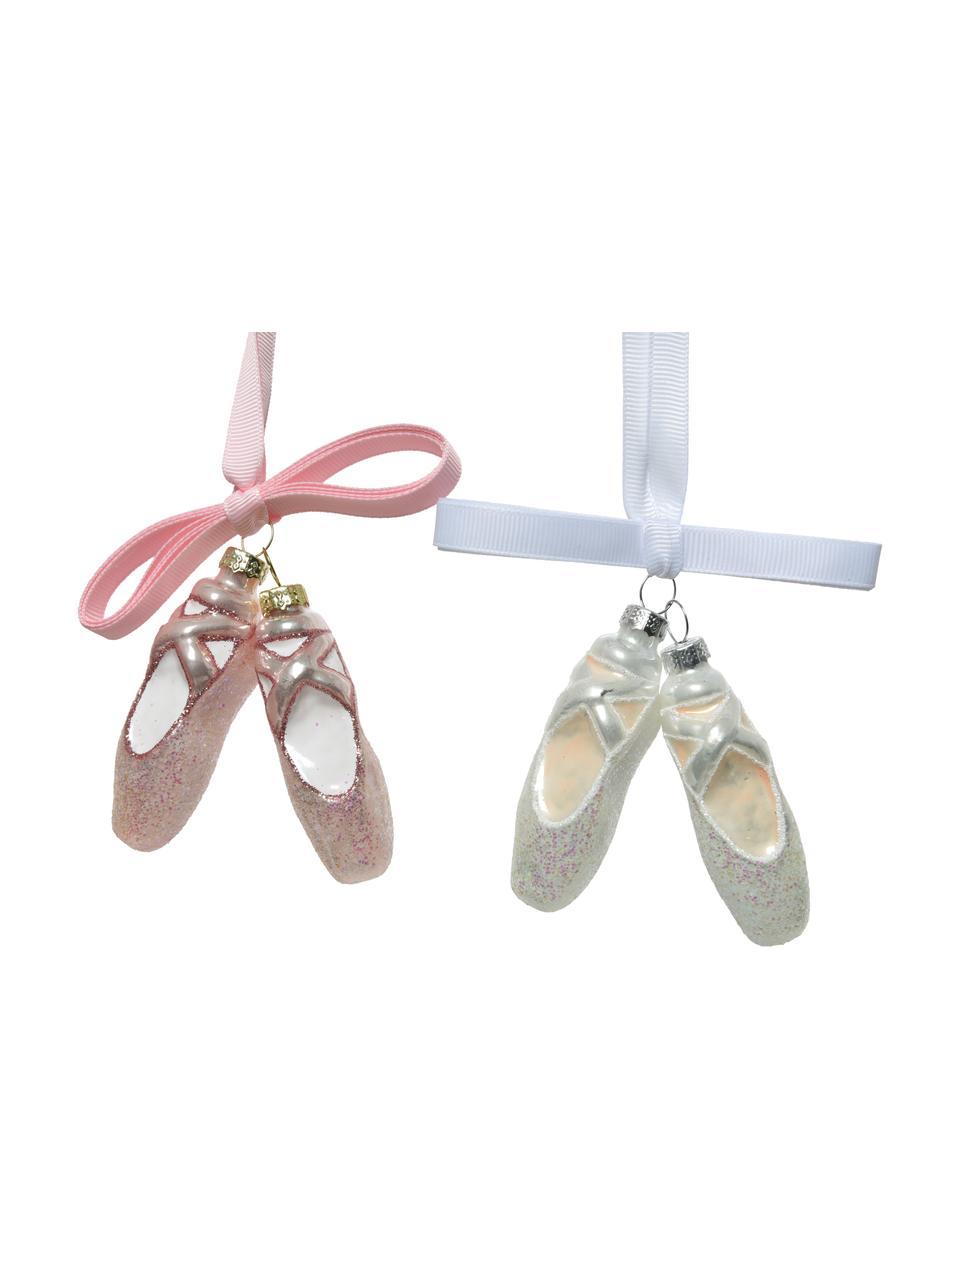 Baumanhänger Ballerinas H 9 cm, 2 Stück, Rosa, Weiß, Silberfarben, 5 x 9 cm